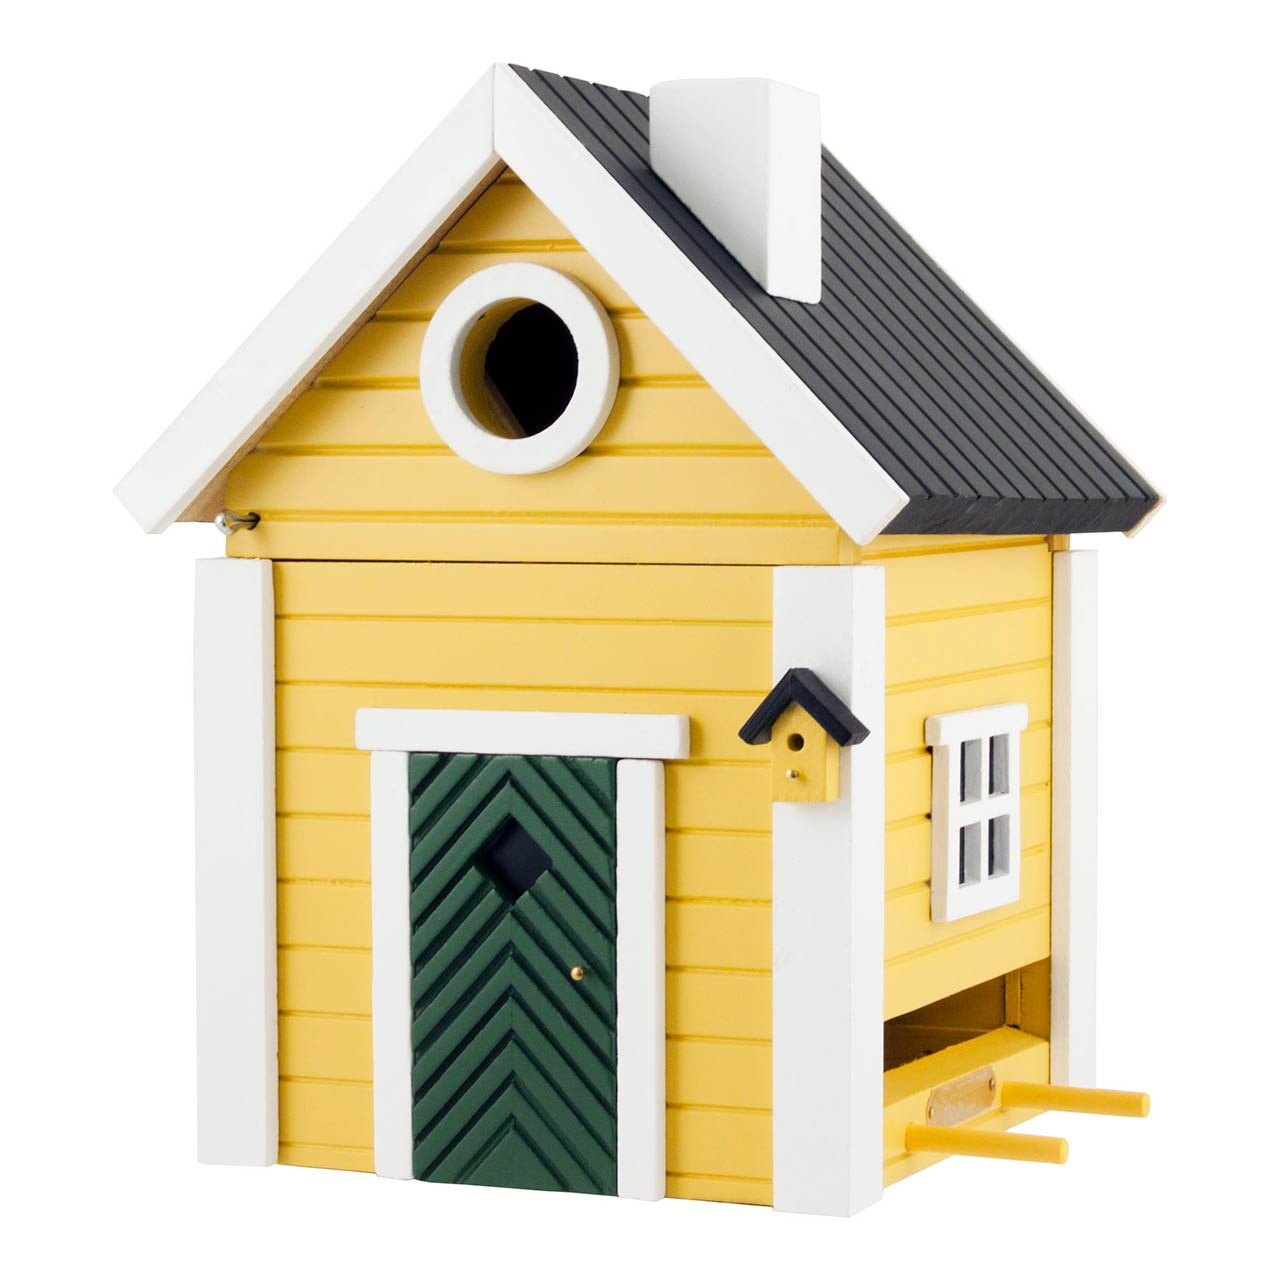 WILDLIFE GARDEN Bird Feeder & Nesting Box Multiholk | Yellow